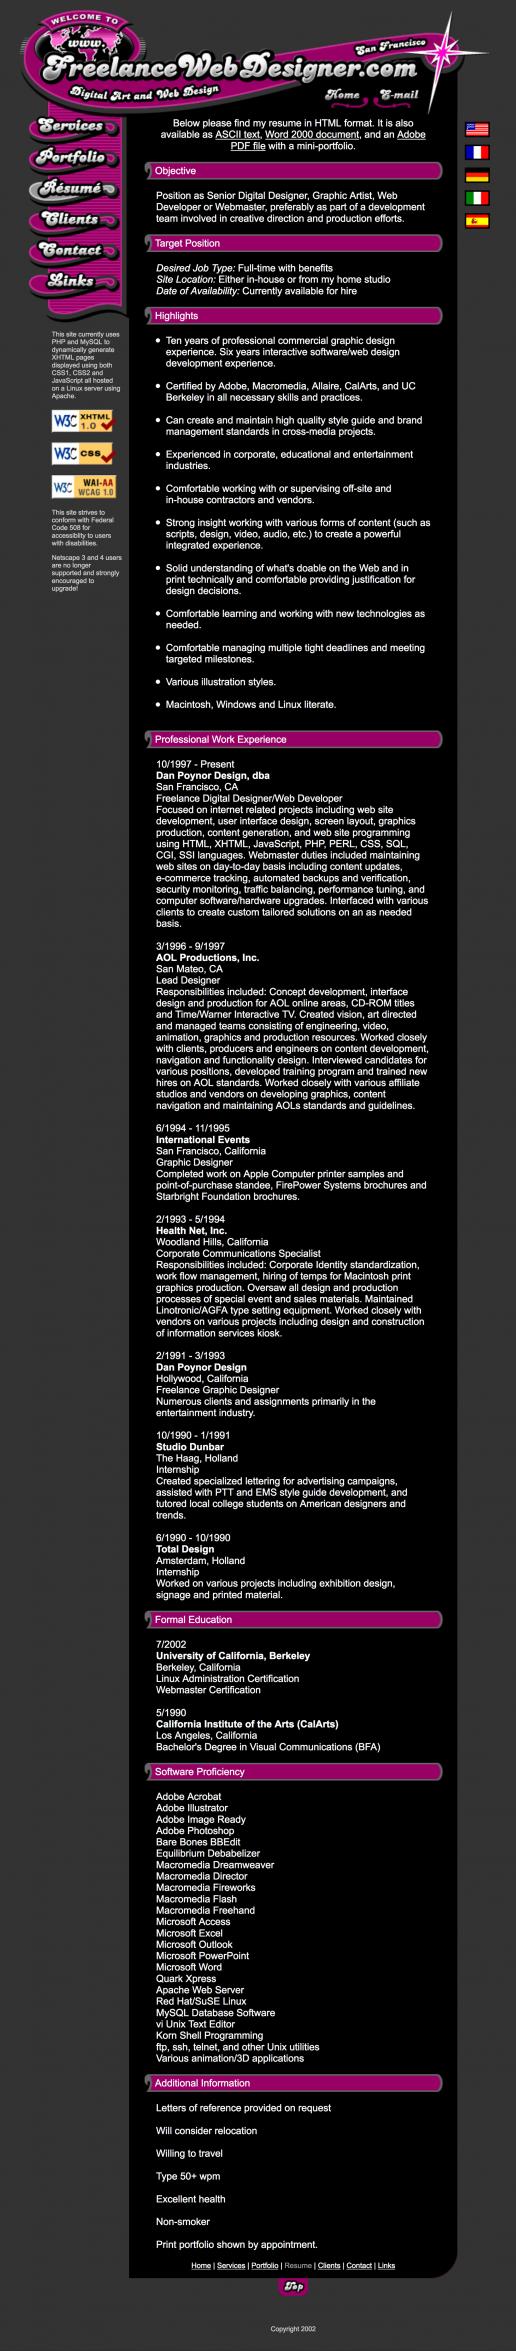 freelance-web-designer-resume-page